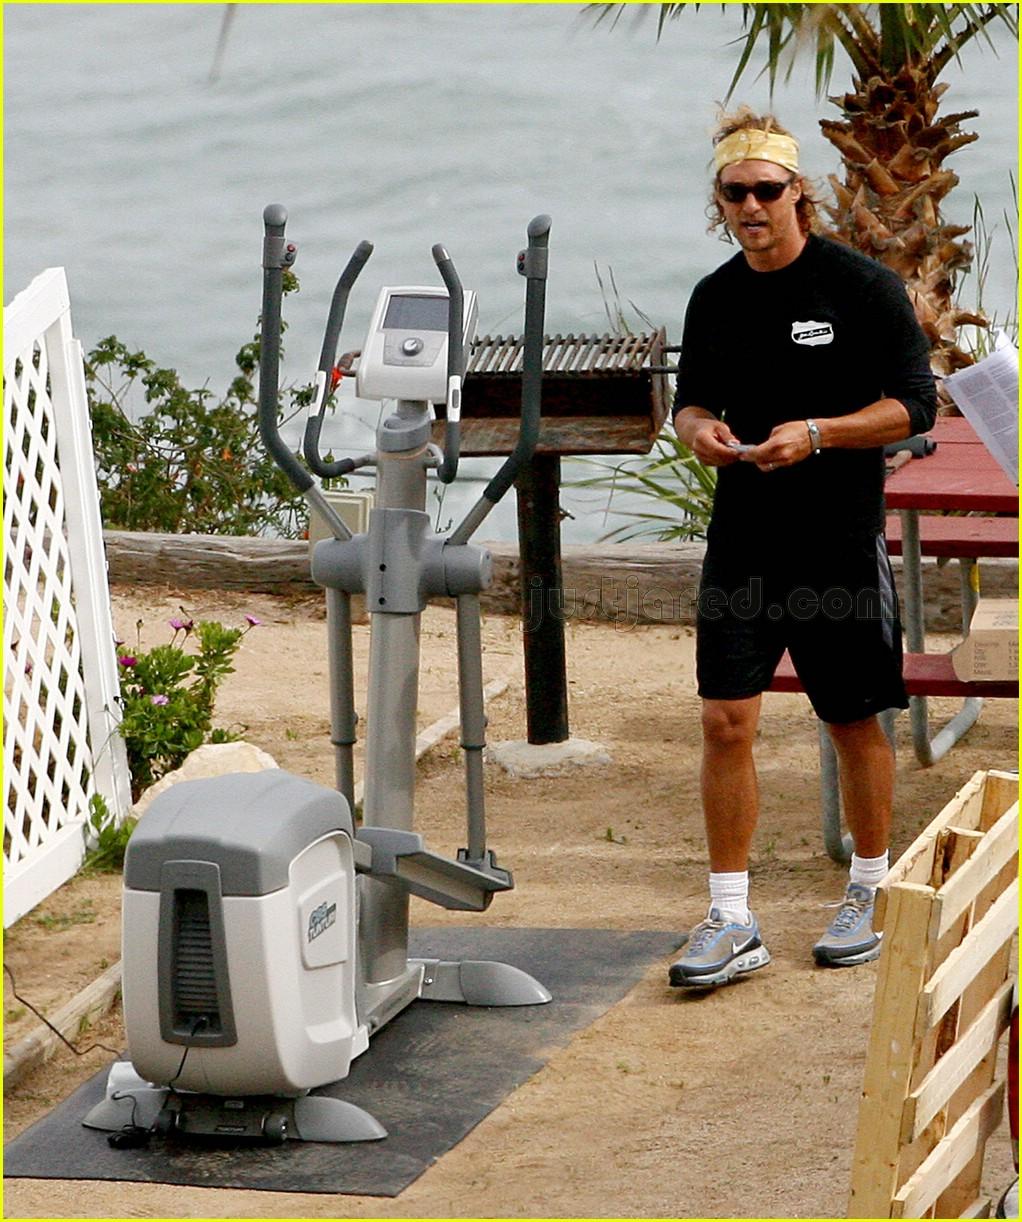 matthew mcconaughey elliptical exercise machine 10